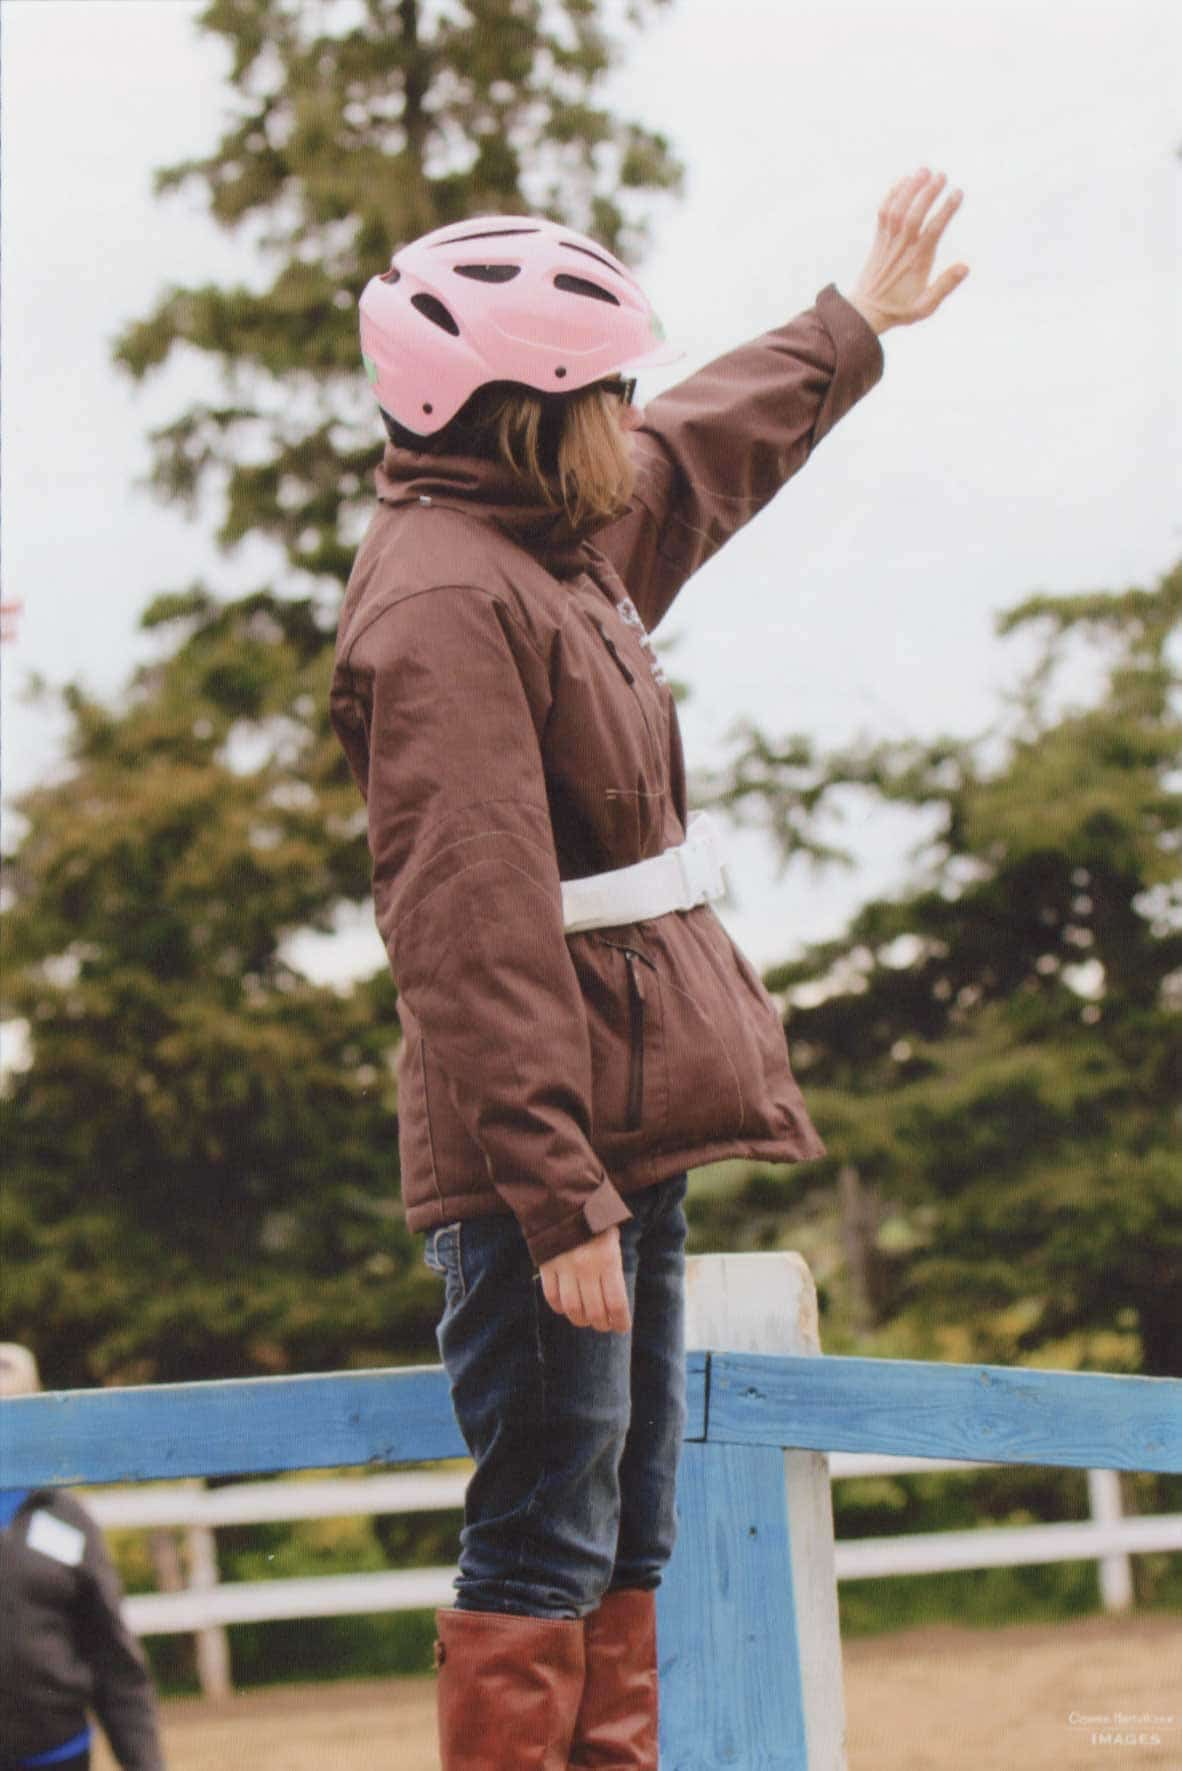 waving rider